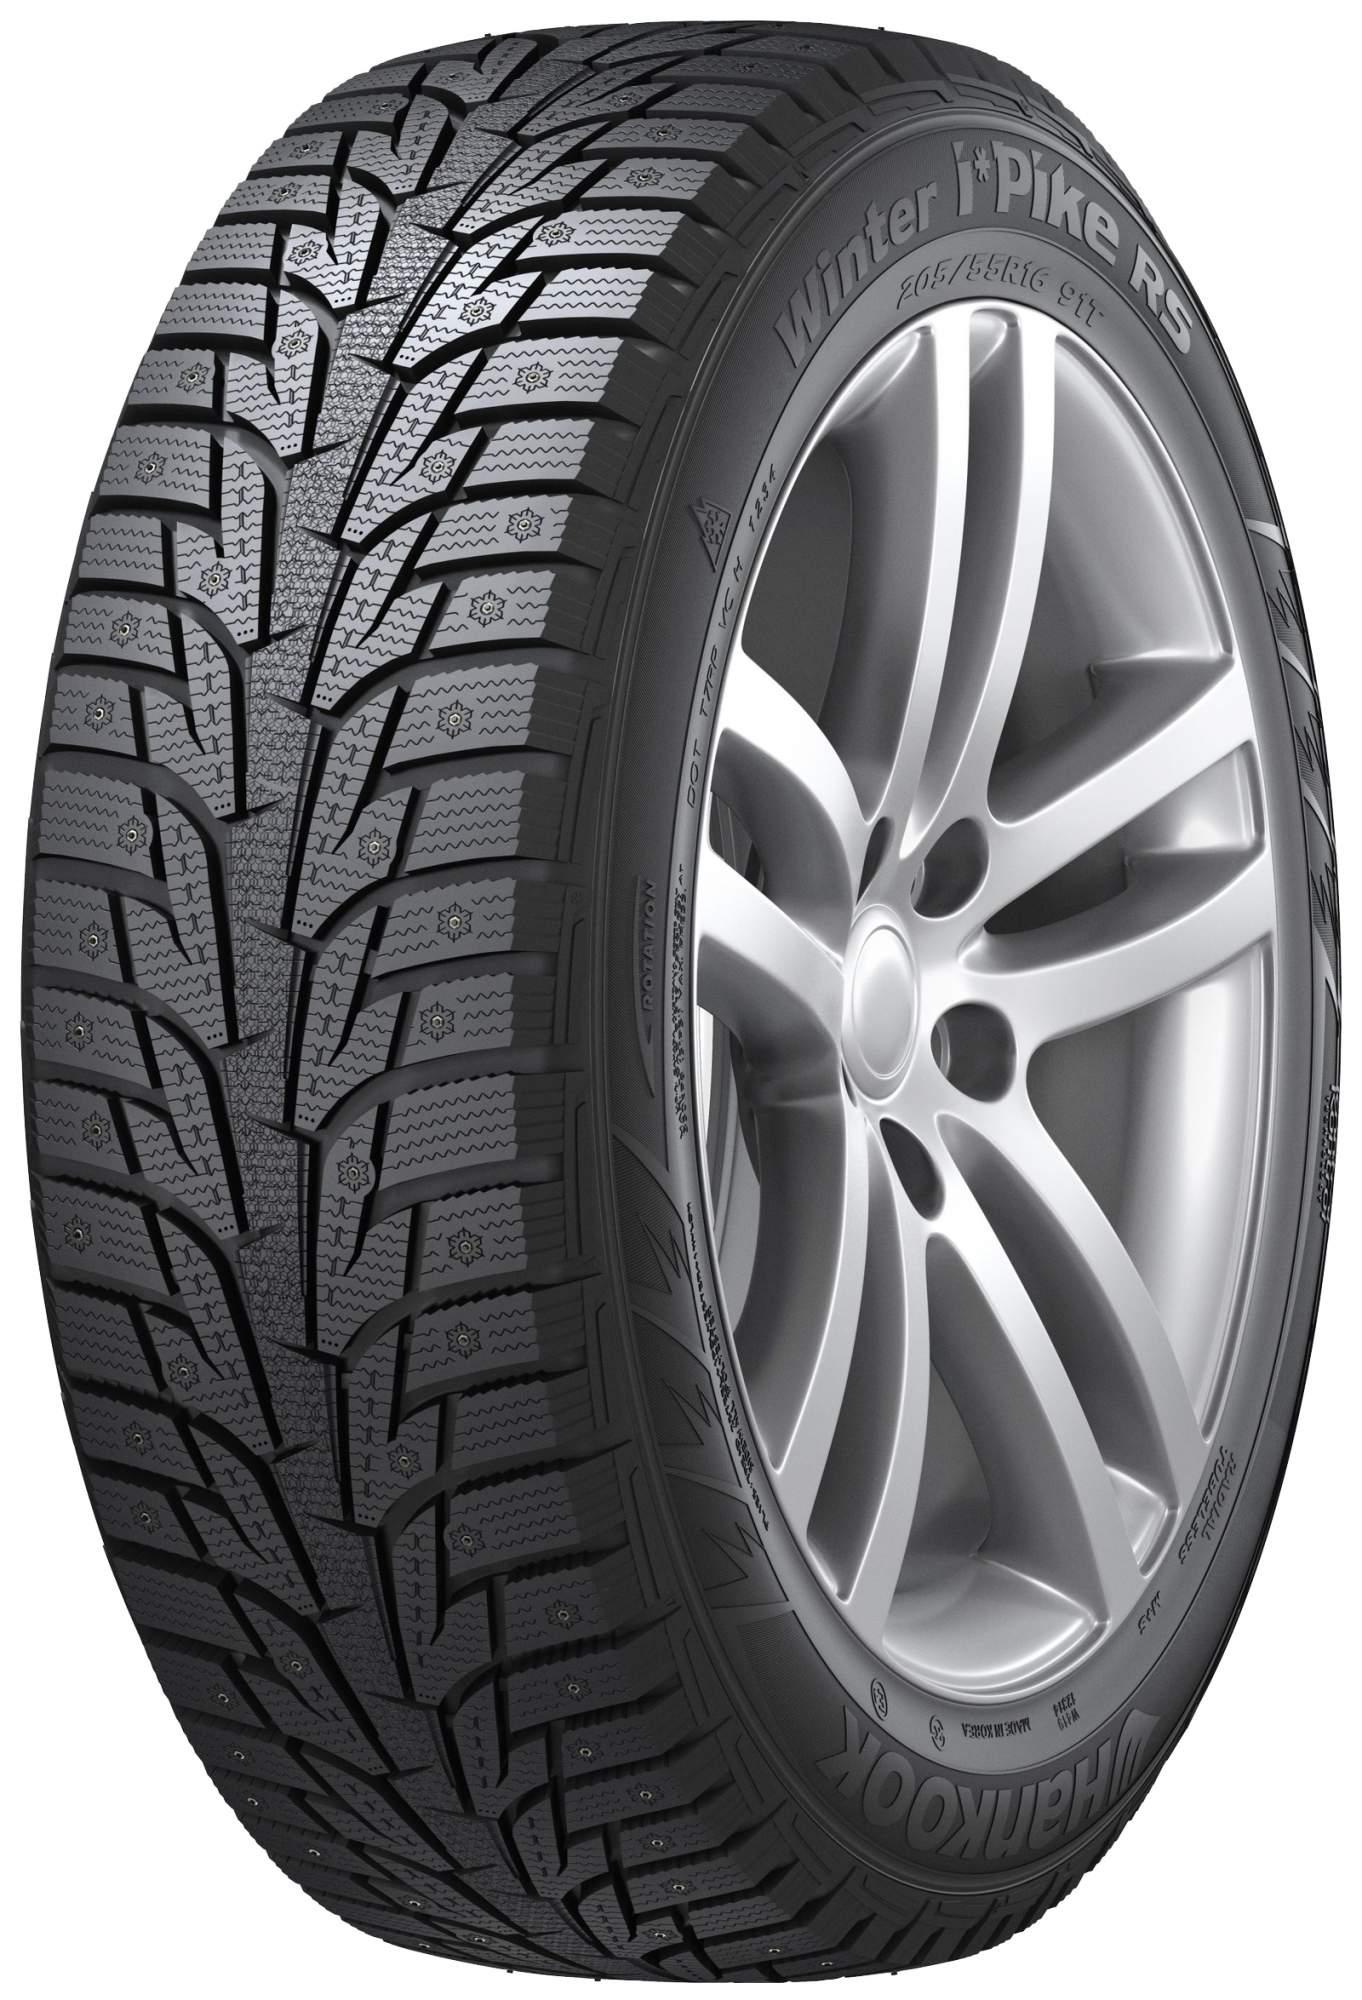 Winter i*Pike RS W419 245/45 R18 100T Зимняя Легковая